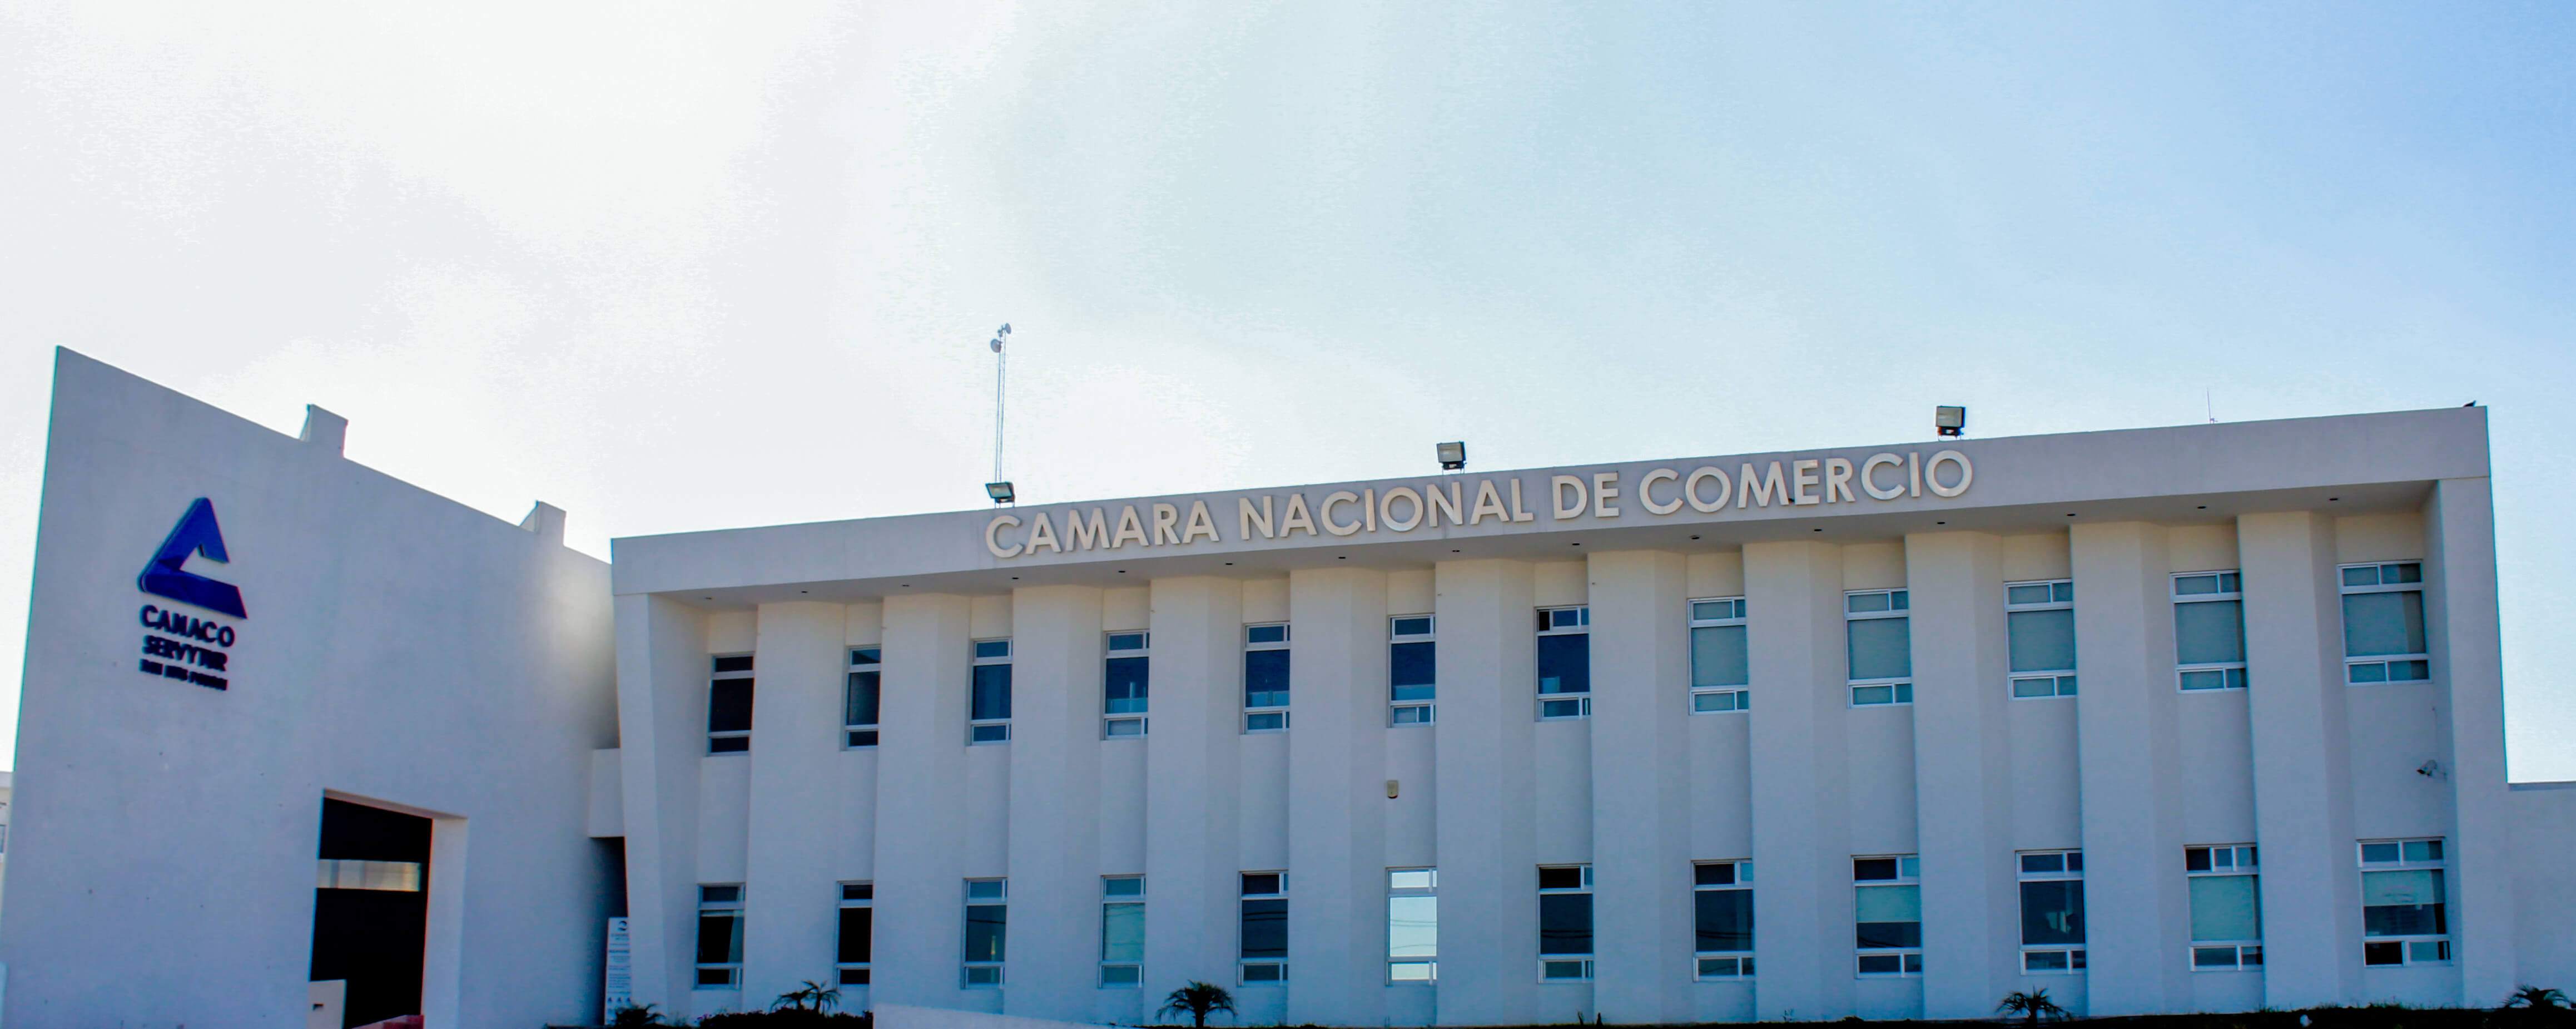 Empresas Canaco San Luis